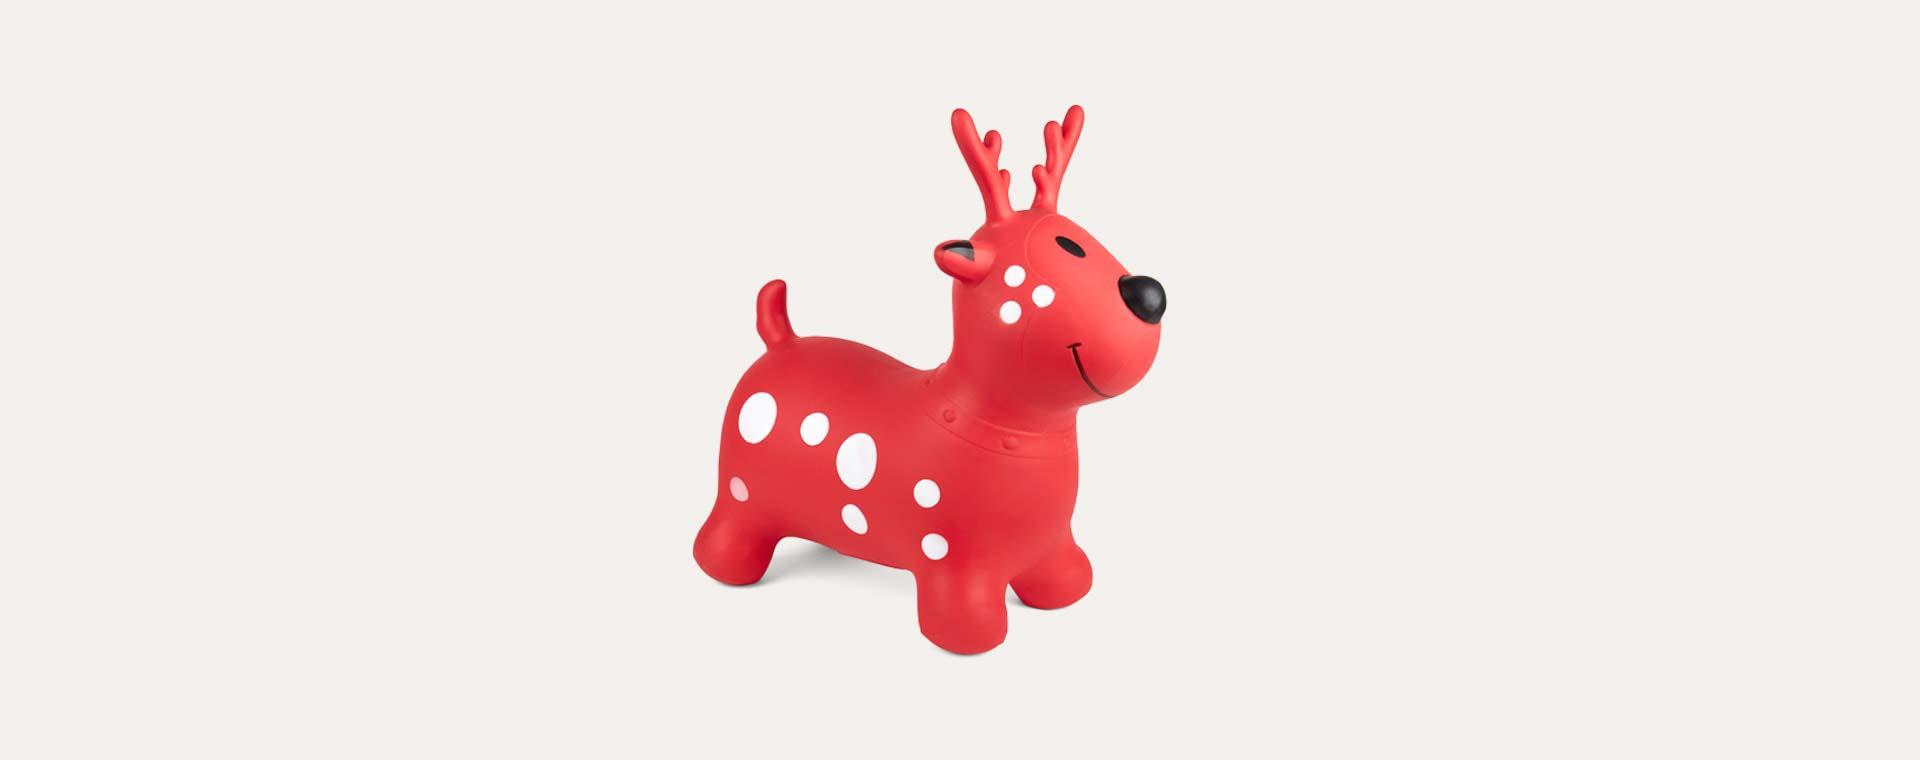 Red Happy Hopperz Deer Happy Hopper